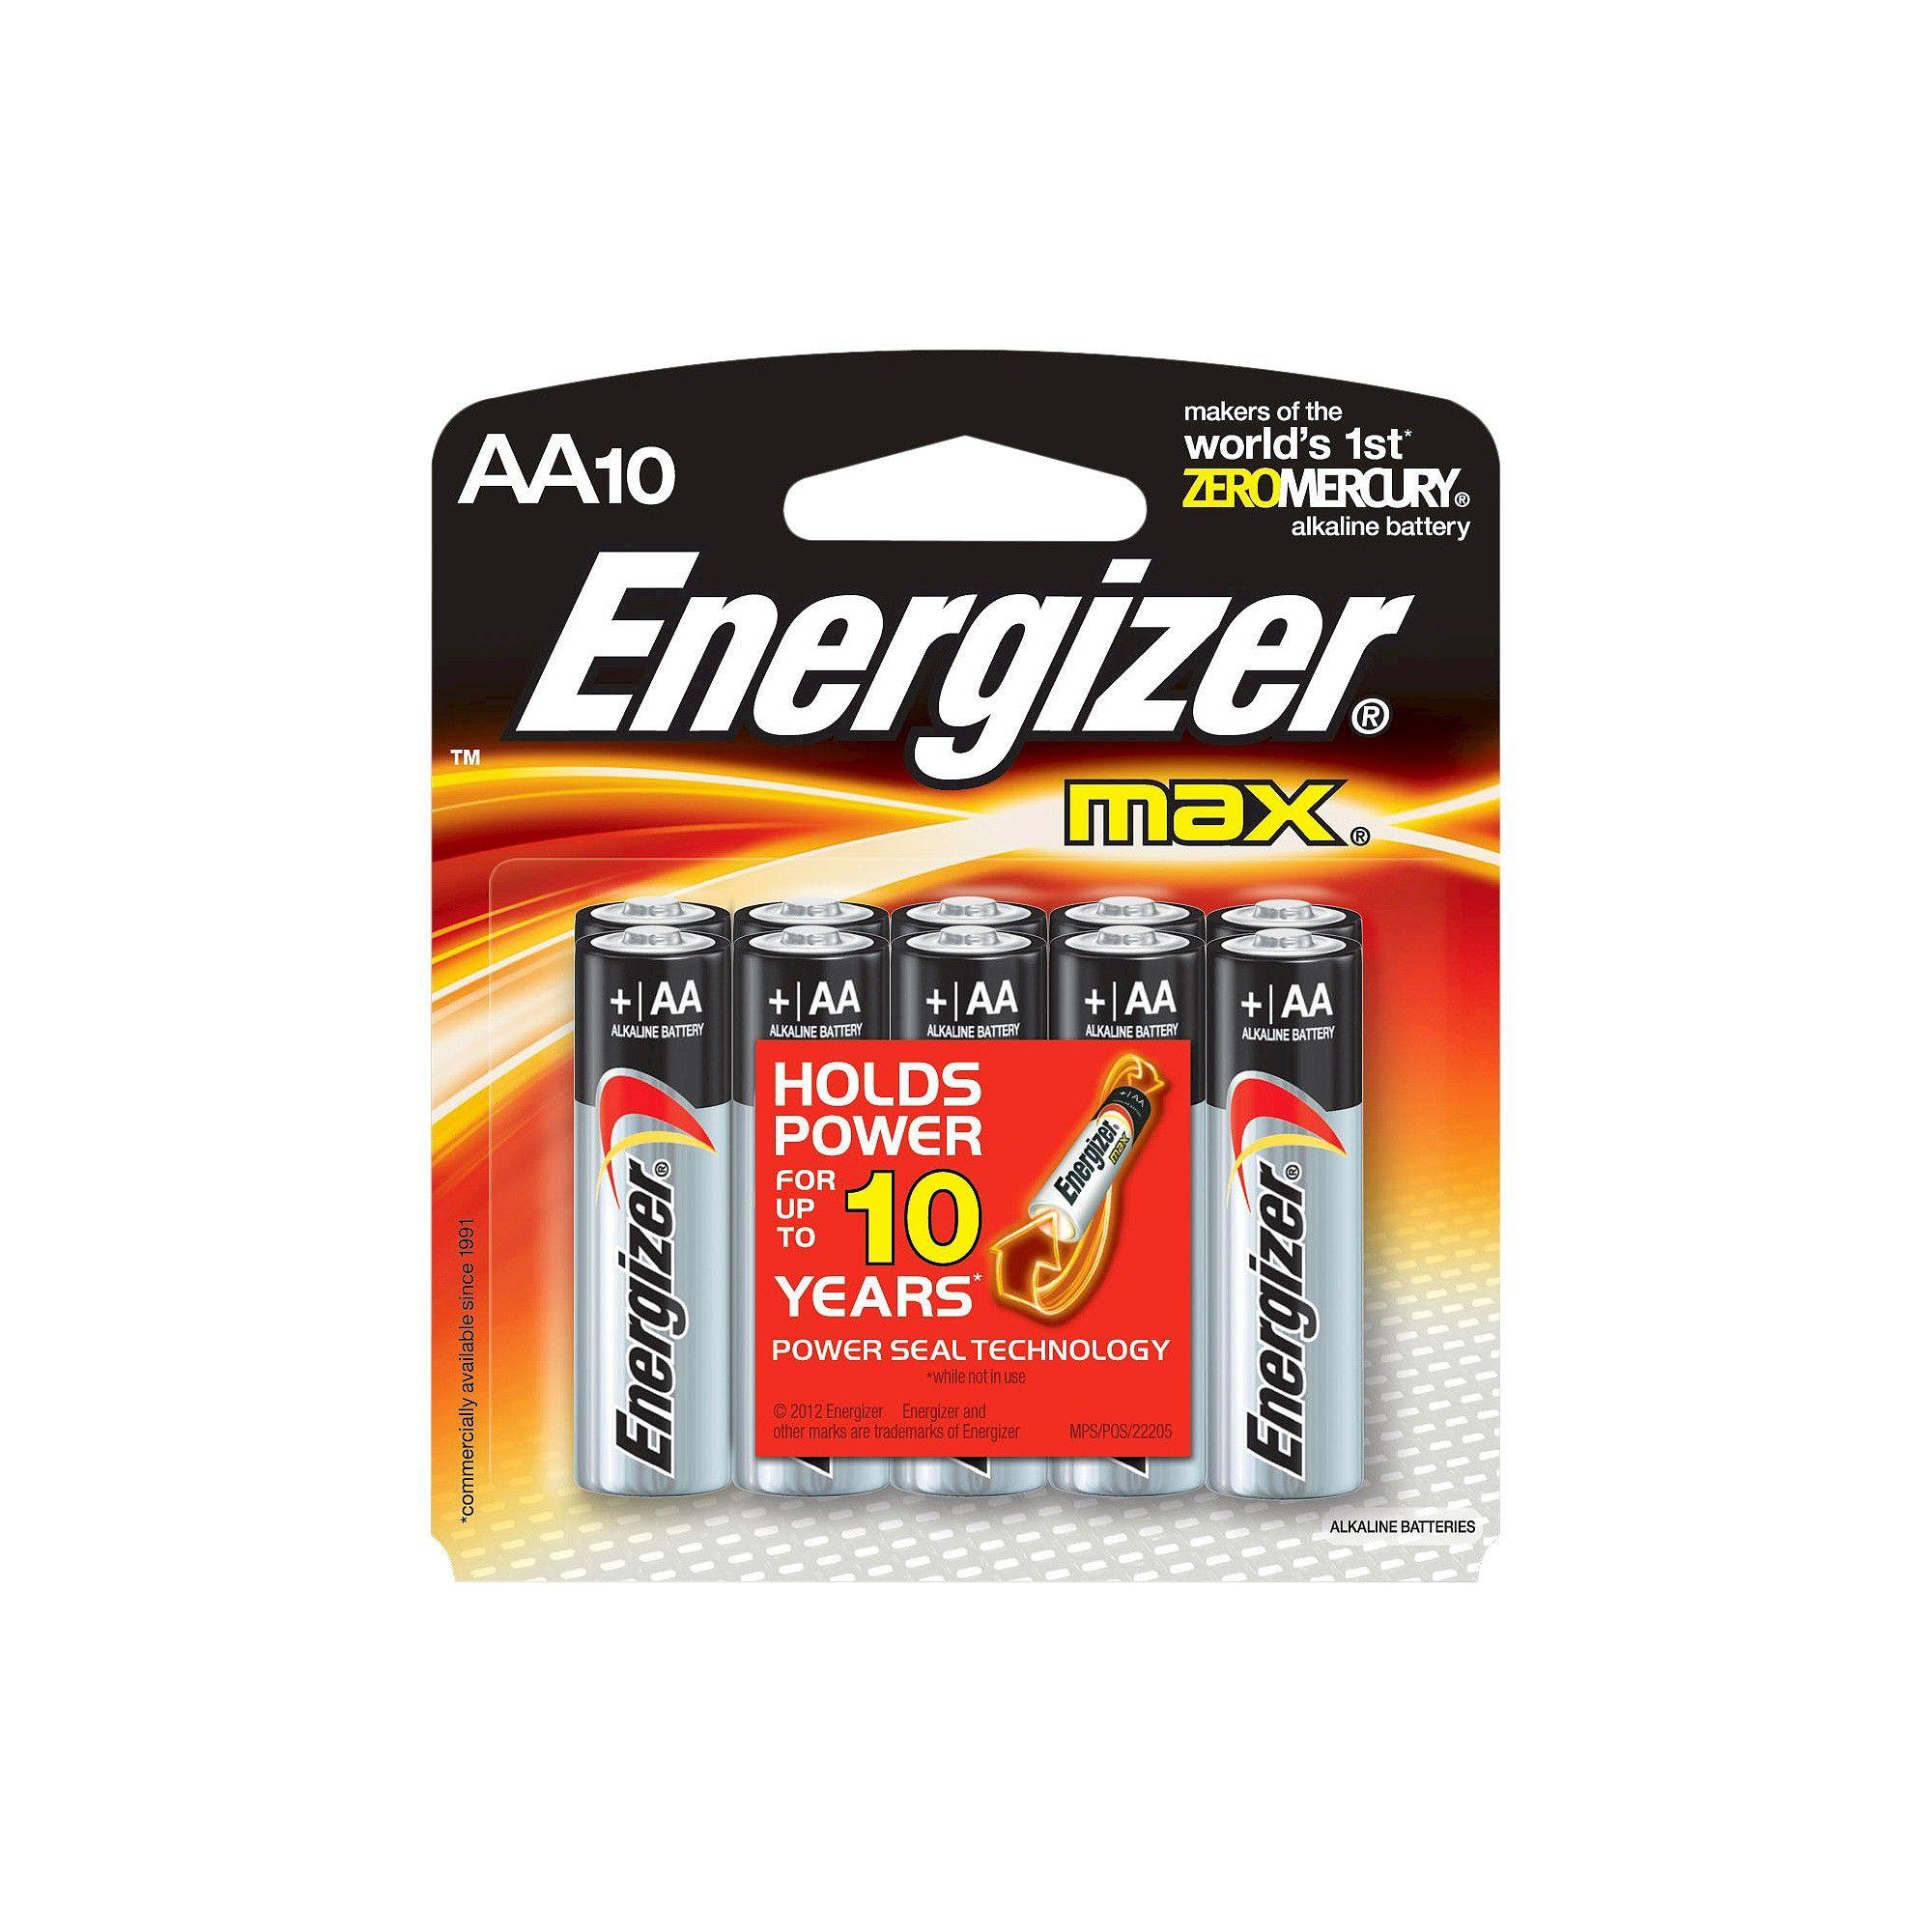 Energizer 10pk Max Alkaline Aa Batteries Energizer Energizer Battery Alkaline Battery